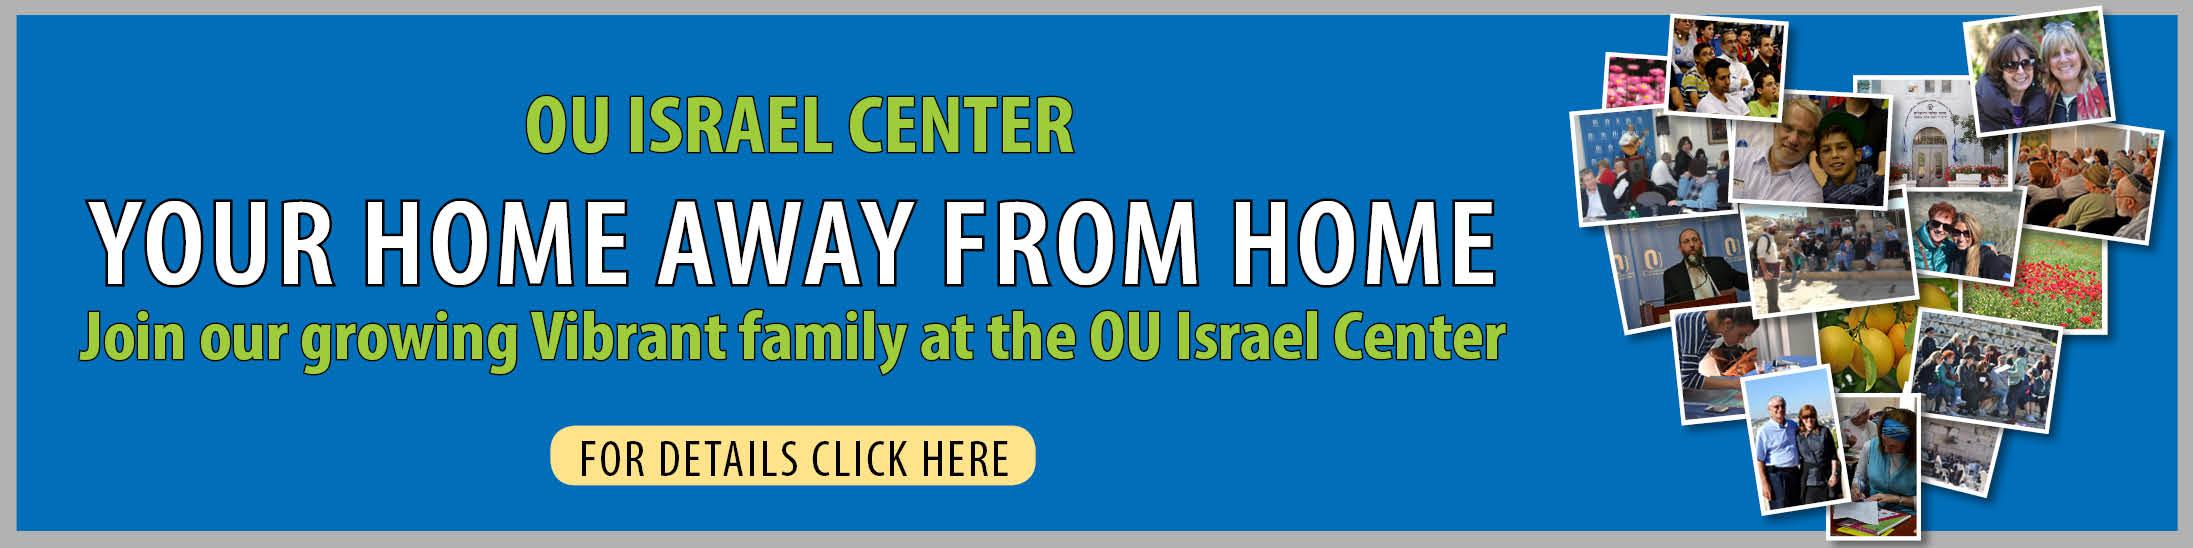 home ou israel